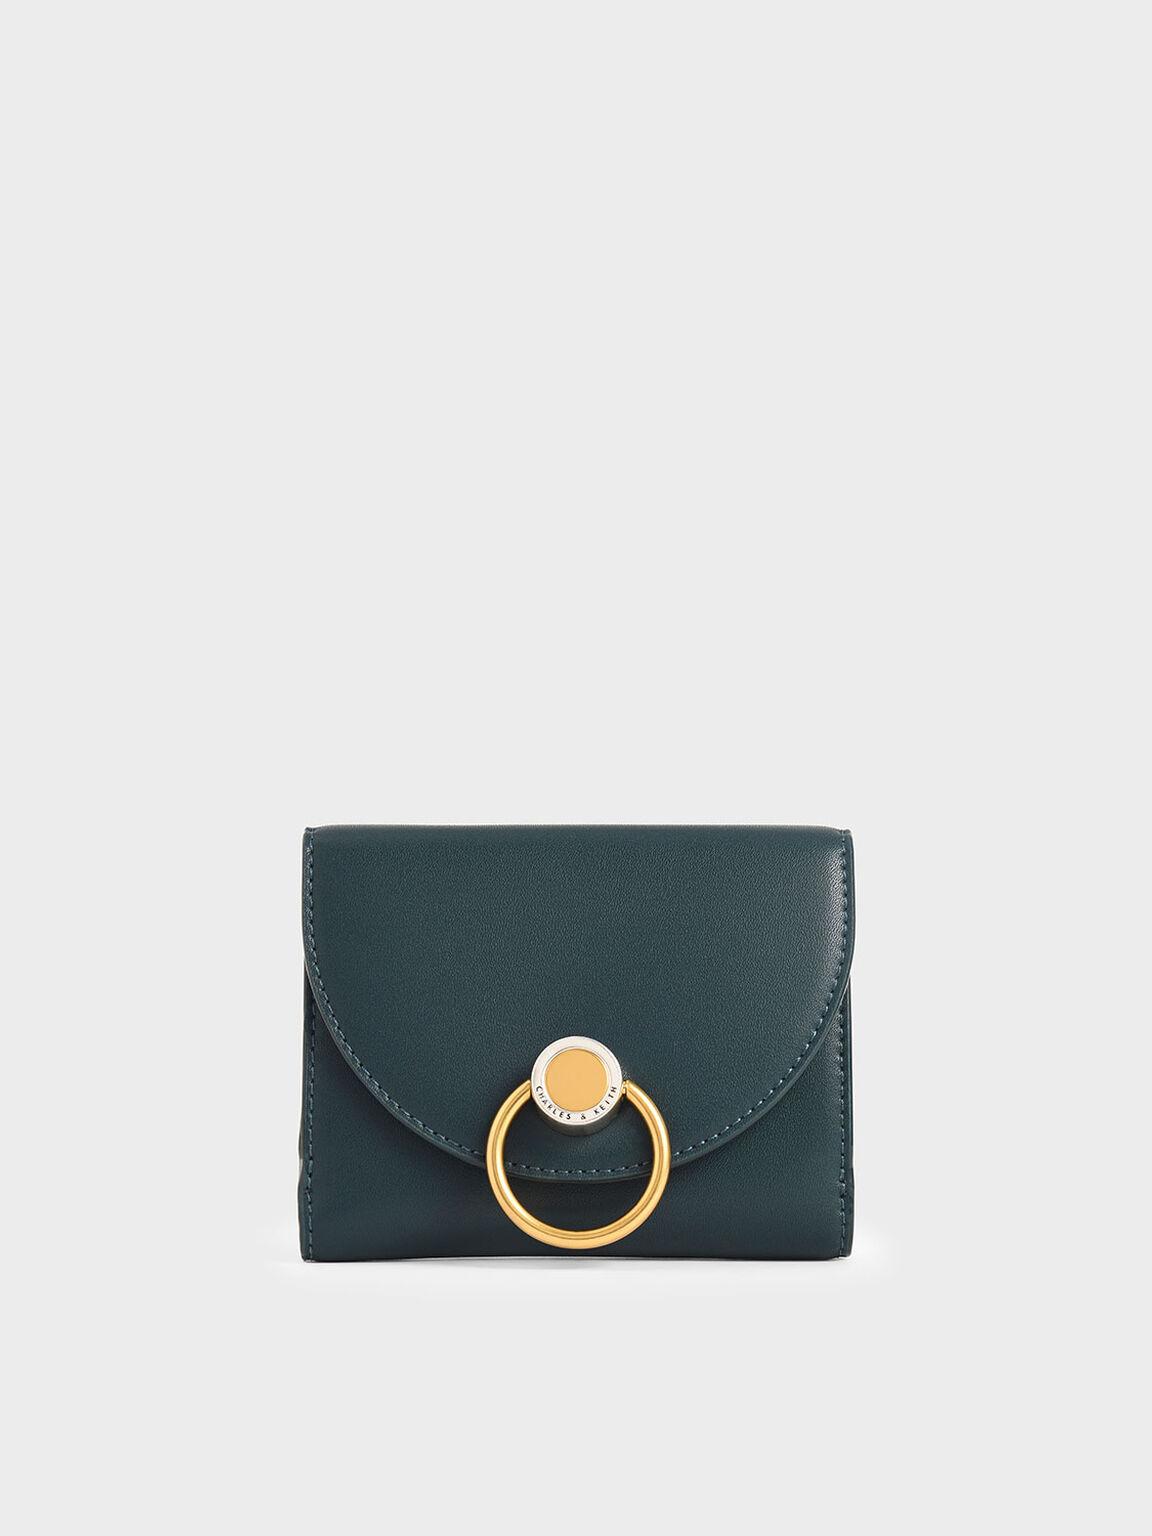 Ring Push-Lock Mini Wallet, Teal, hi-res